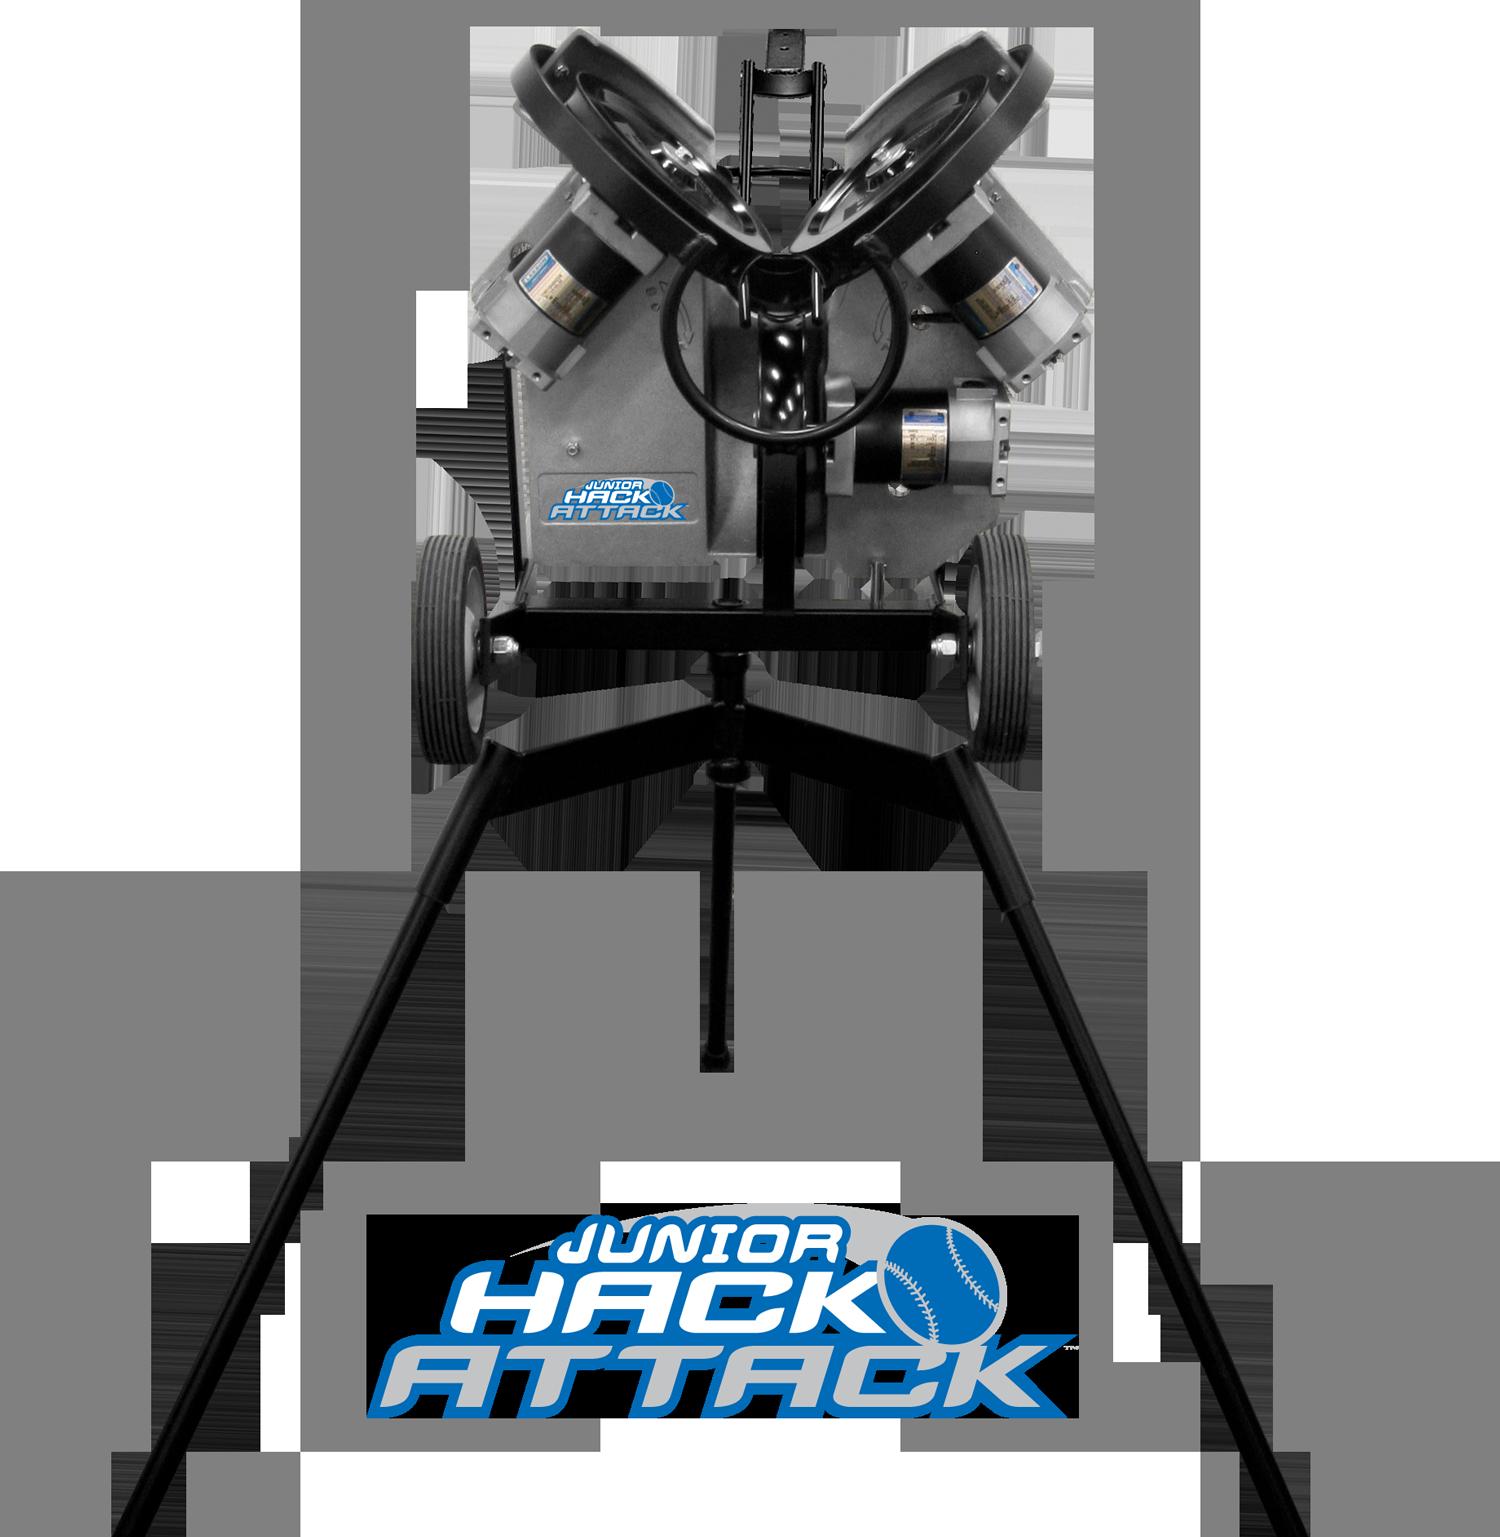 sports attack hack junior